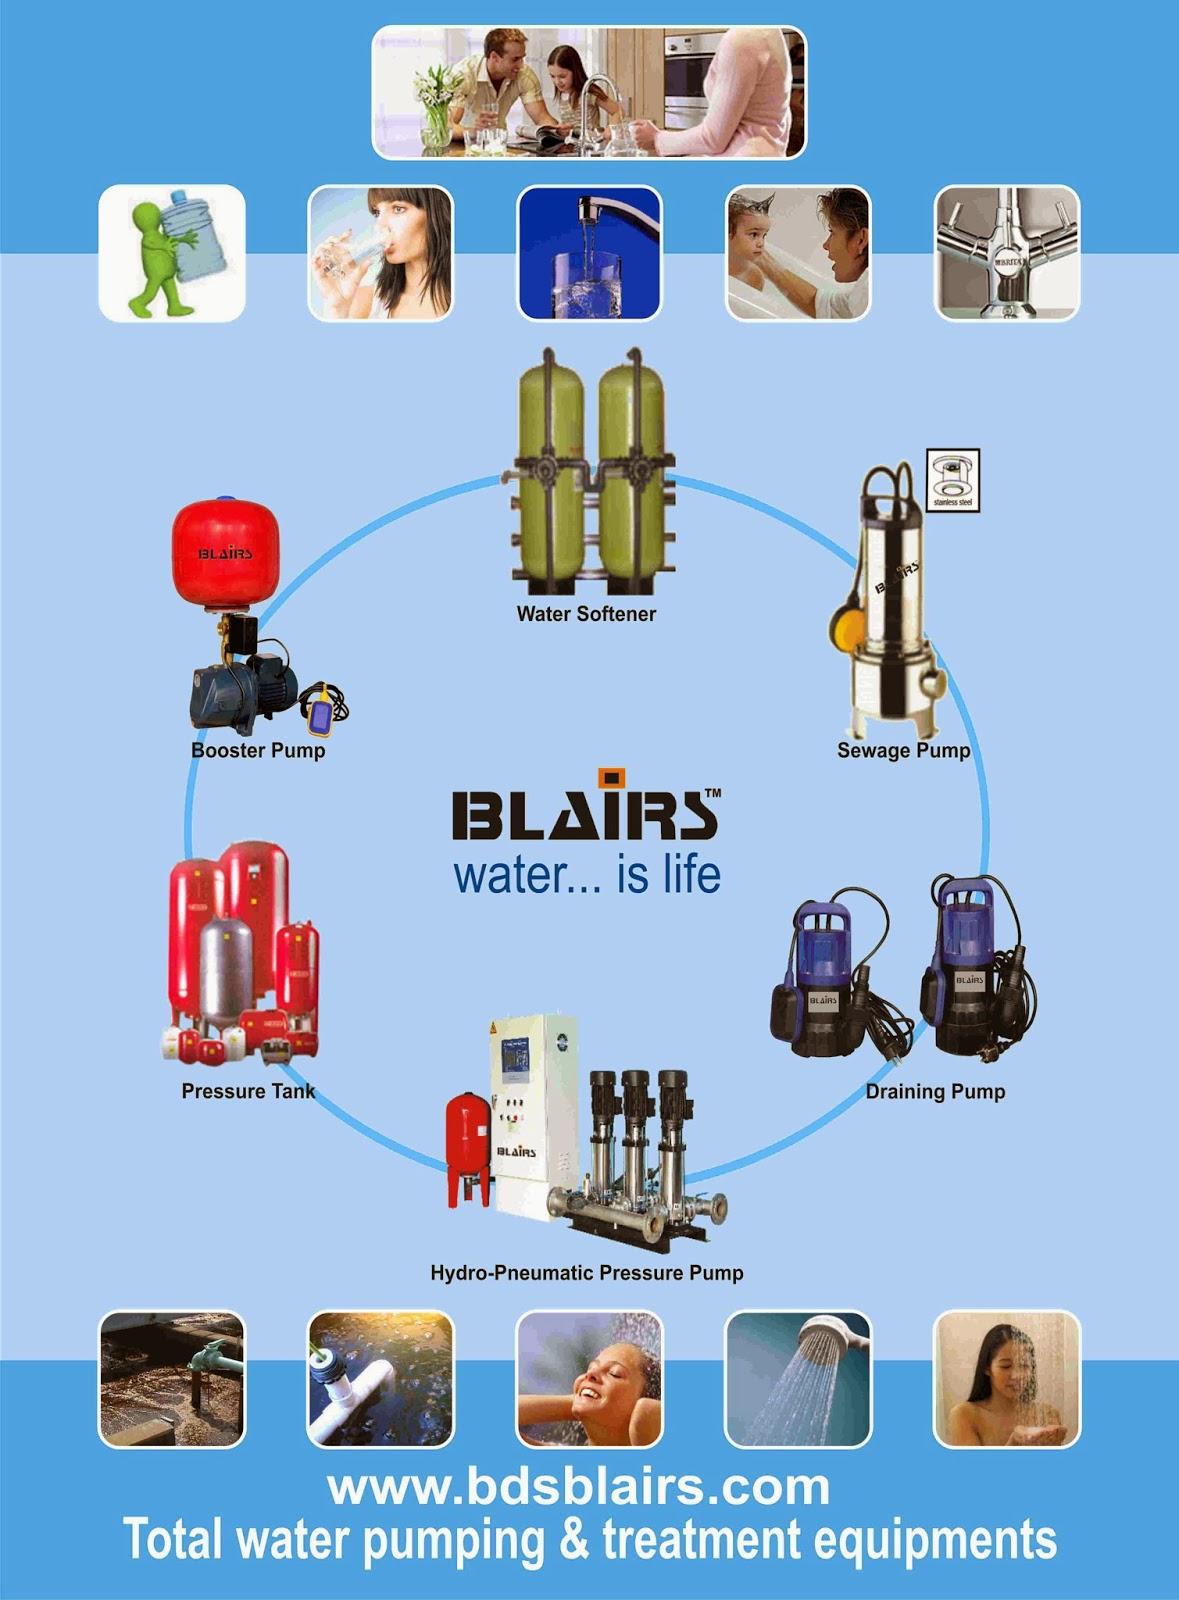 www.bdsblairs.com